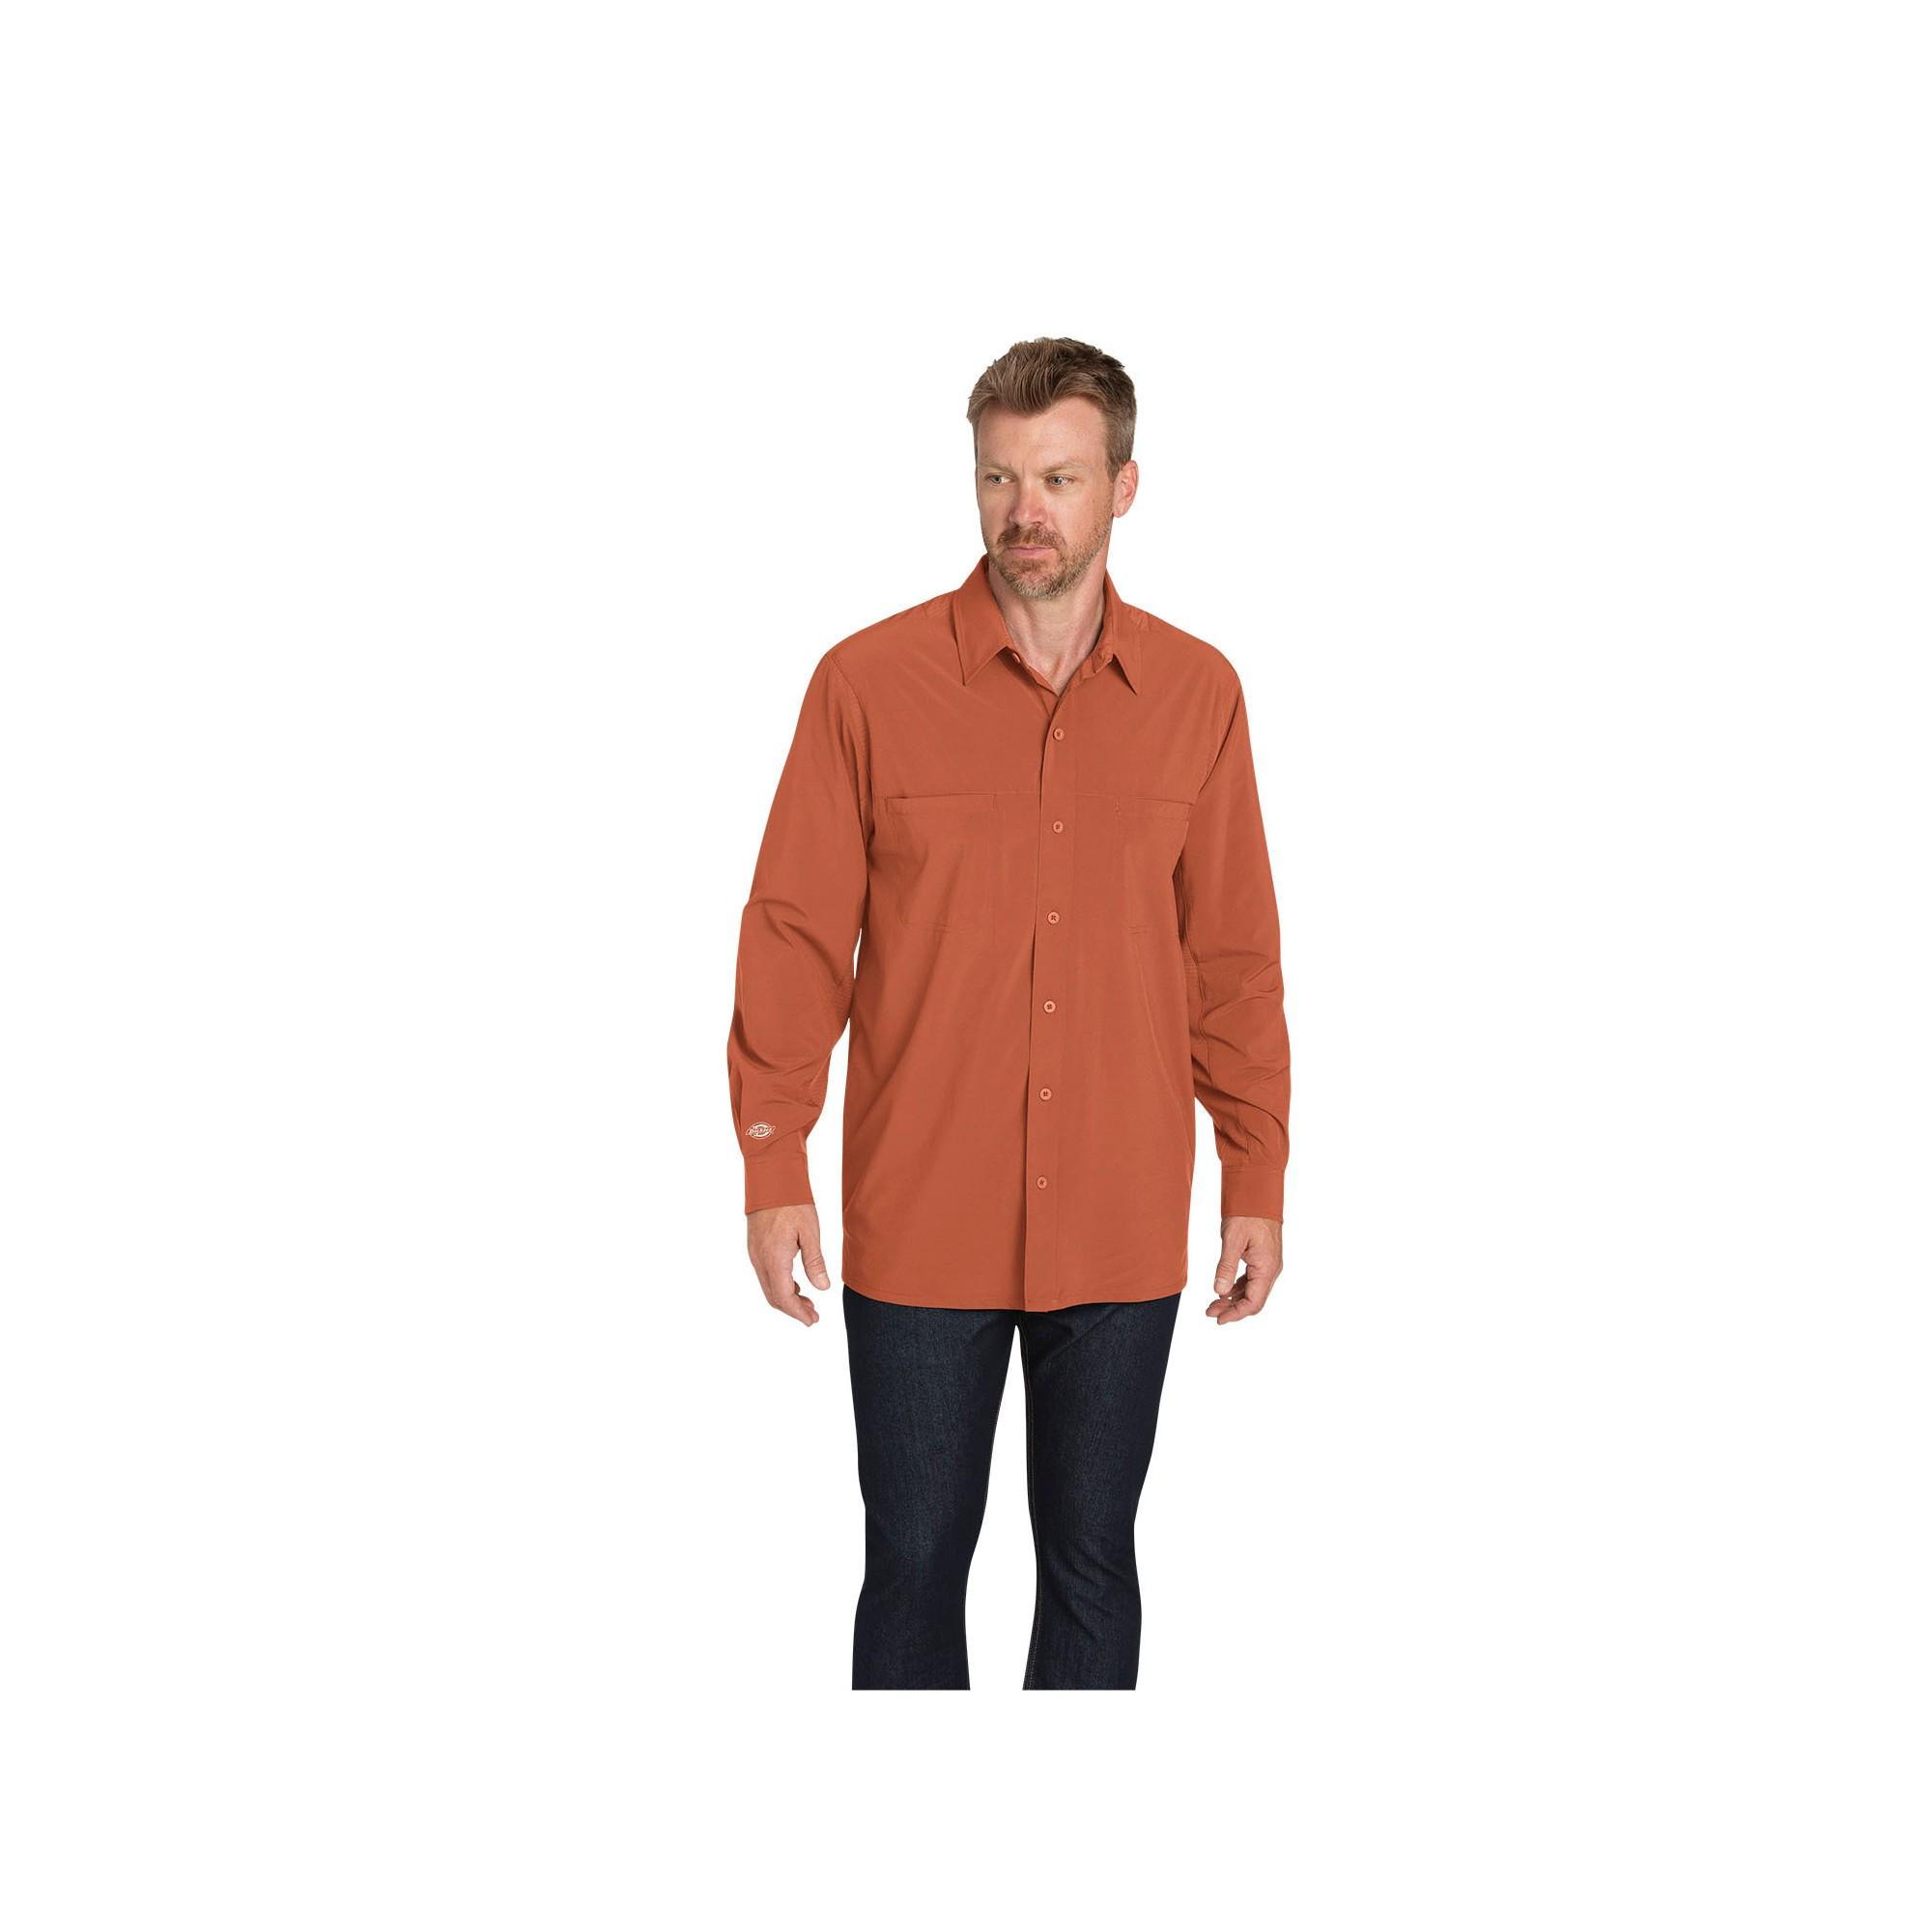 Dickies Men S Cooling Flex Long Sleeve Shirt Spice M Size